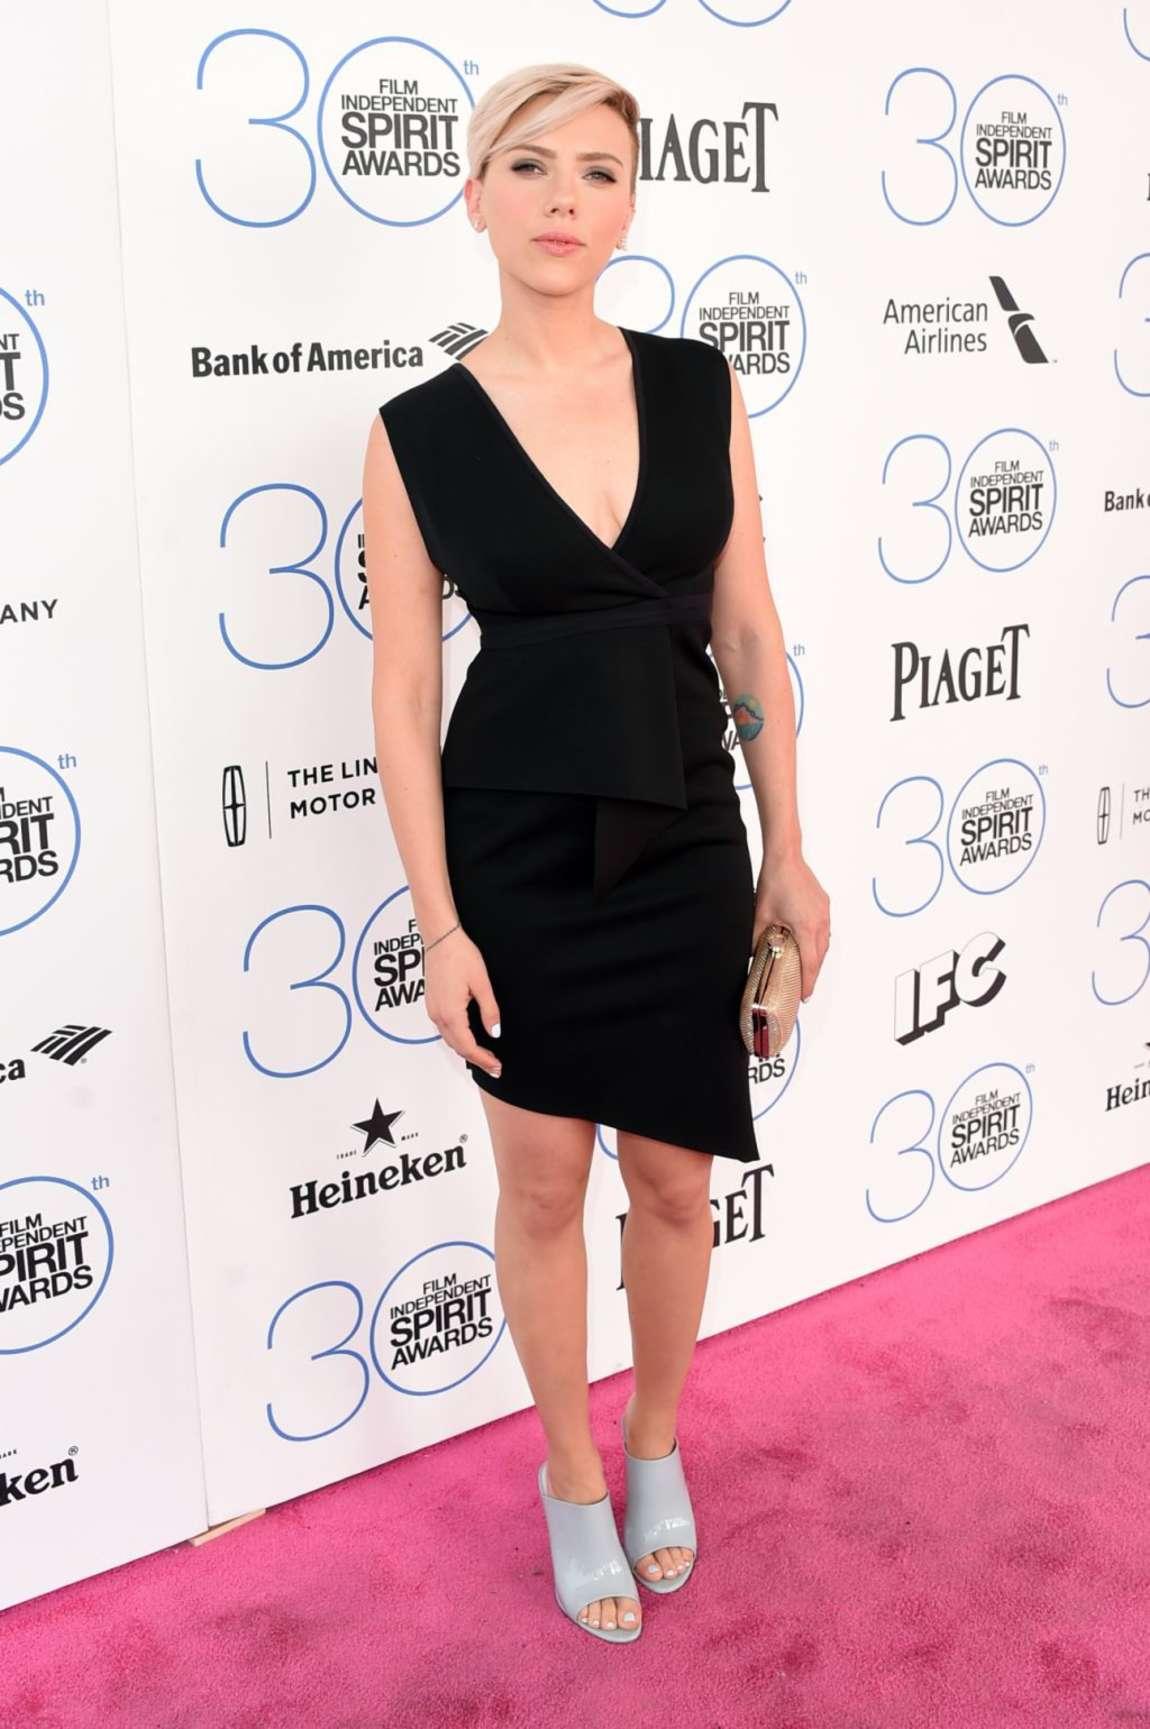 Scarlett Johansson - 2015 Film Independent Spirit Awards in Santa Monica